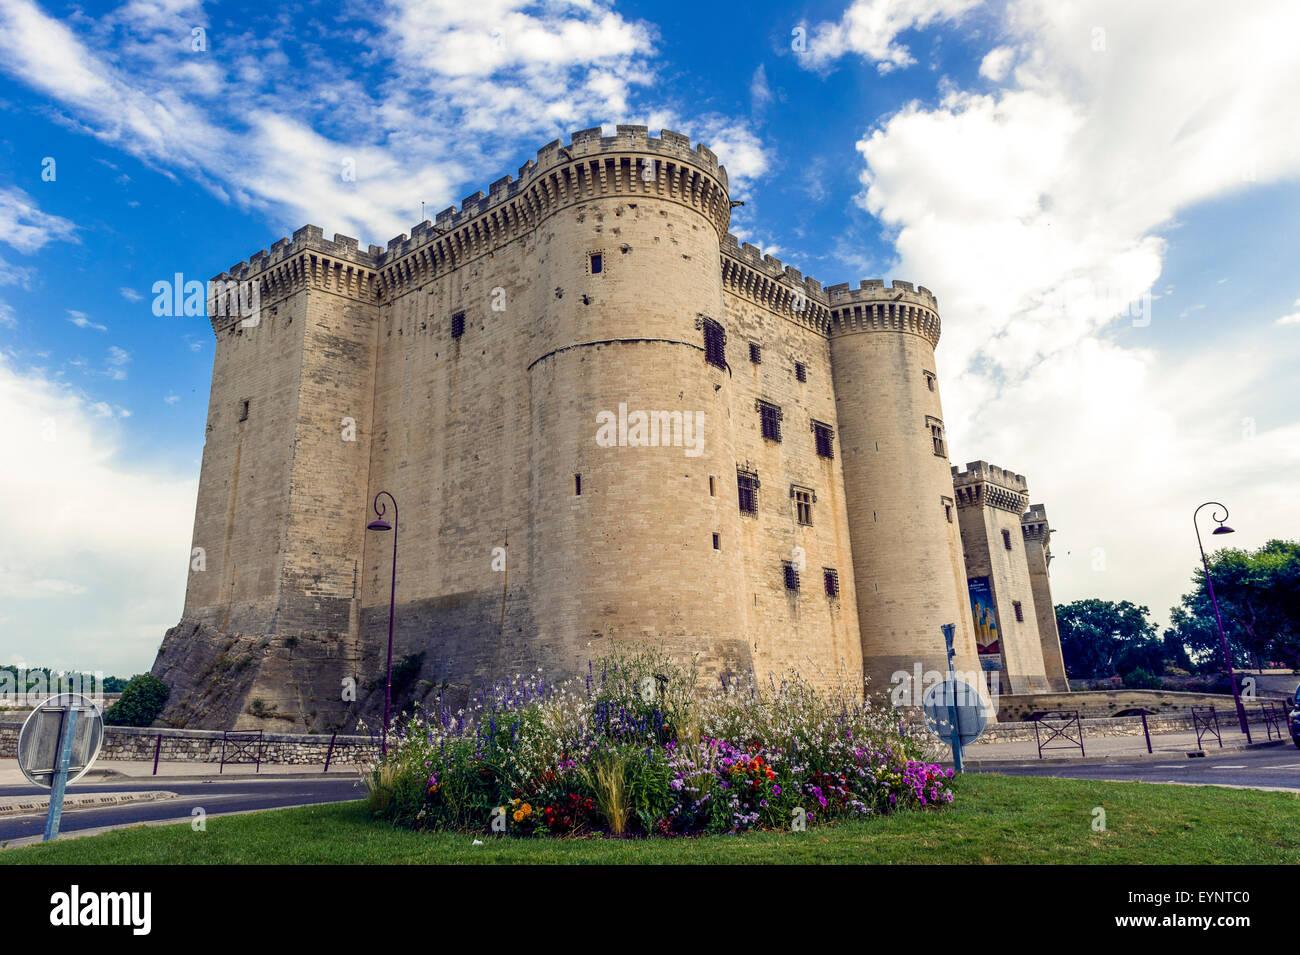 Europe. France. Bouches-du-Rhone. Alpilles. Tarascon. The medieval castle of King René, fifteenth century. - Stock Image